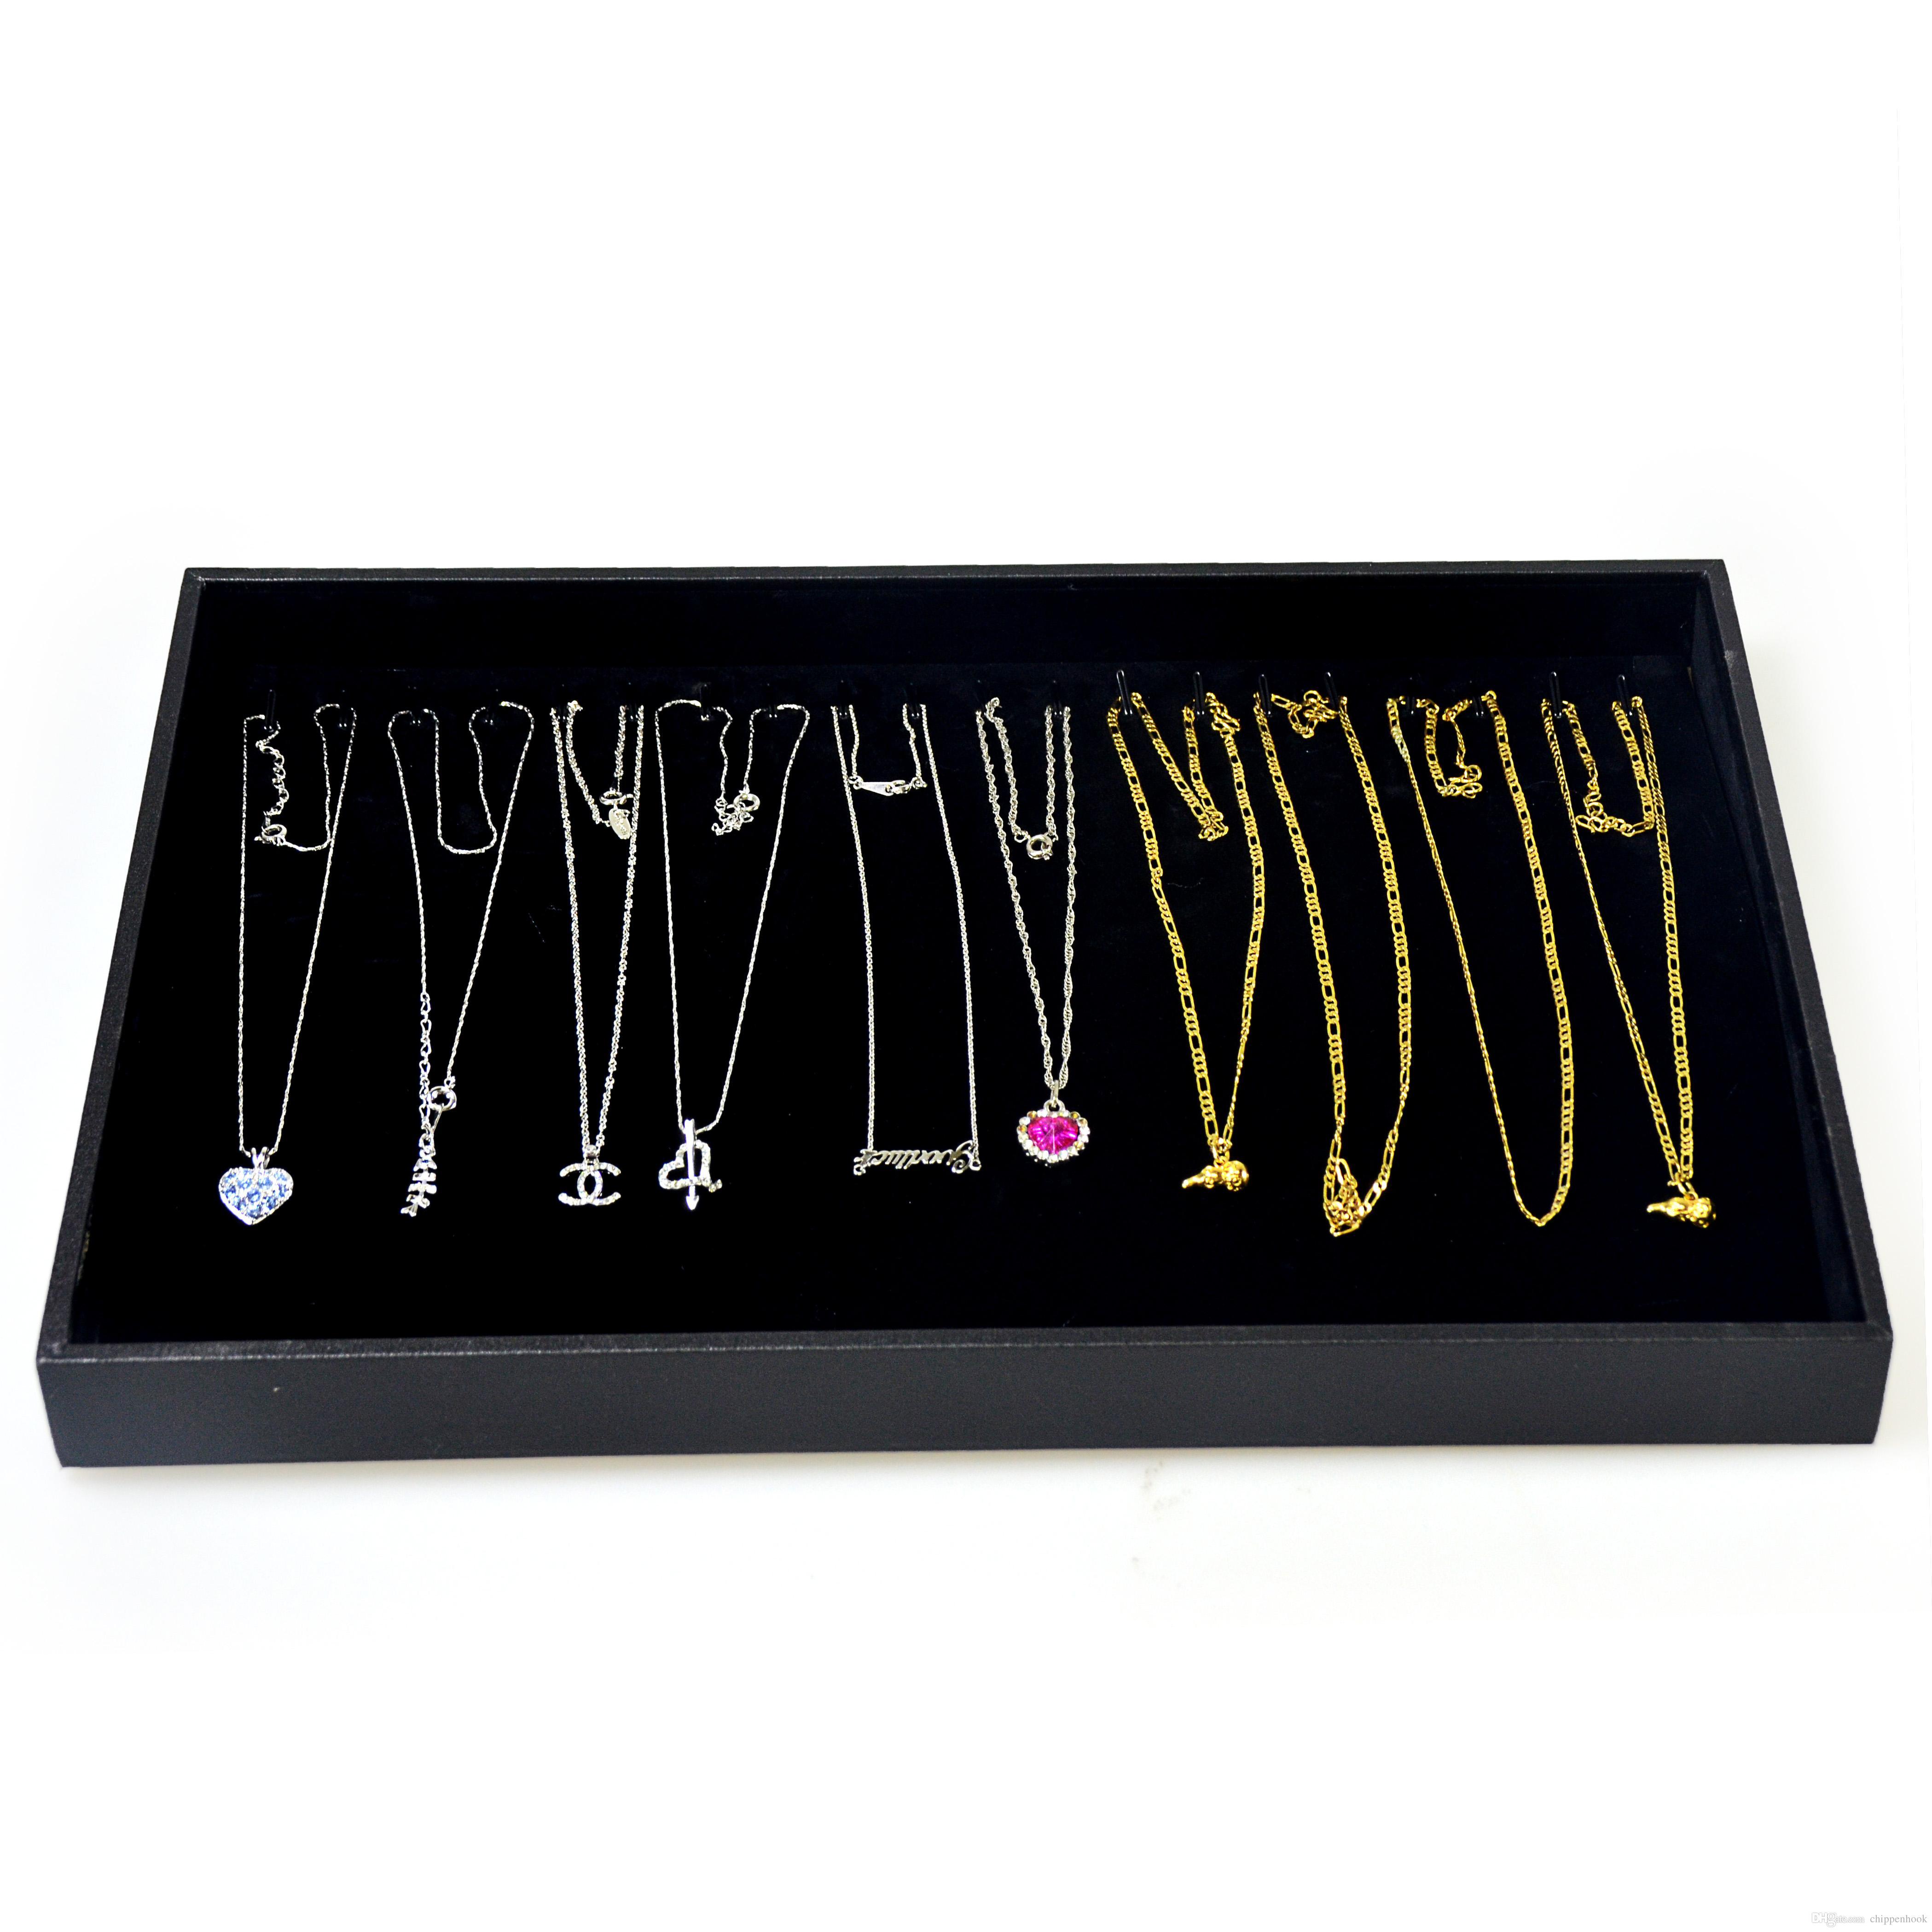 High Quality Wooden Jewelry Display Tray Necklace Bracelet Bead Chain Storage Case Black Pendant Organizer Display Tray 35*25*3cm